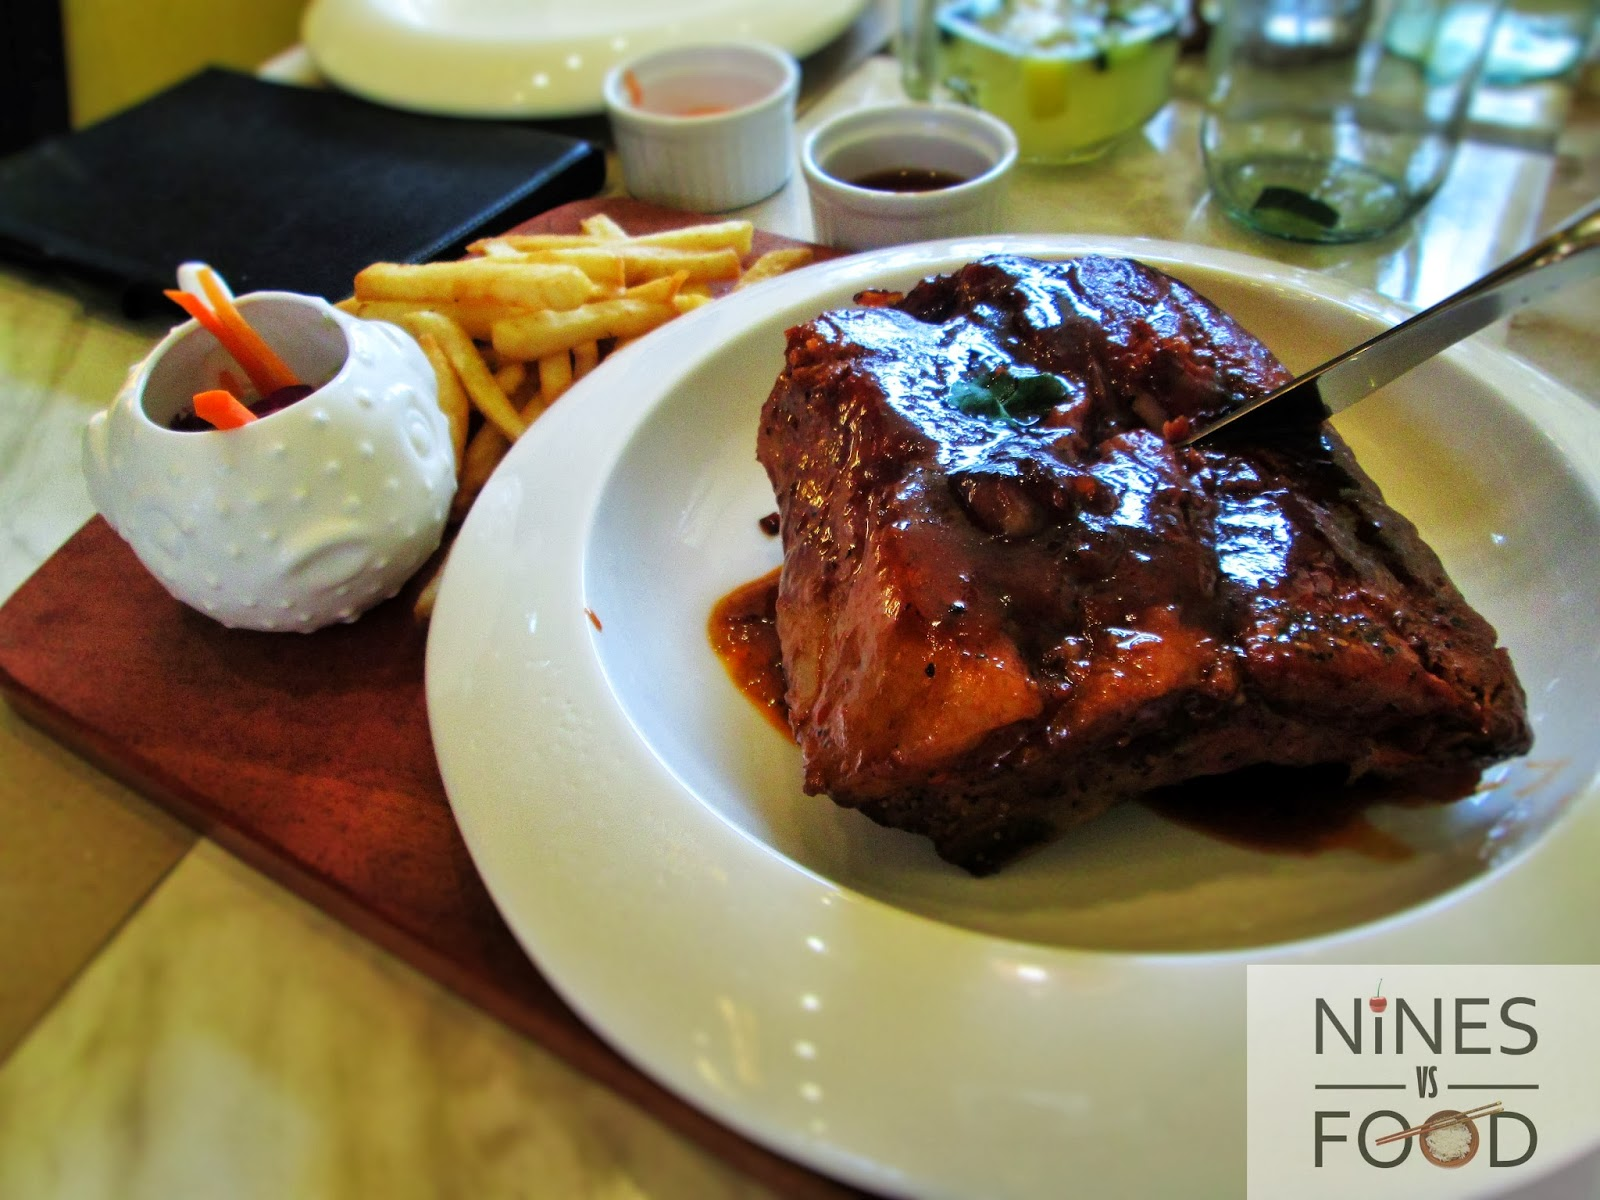 Nines vs. Food - B&P Shaw Mandaluyong-16.jpg